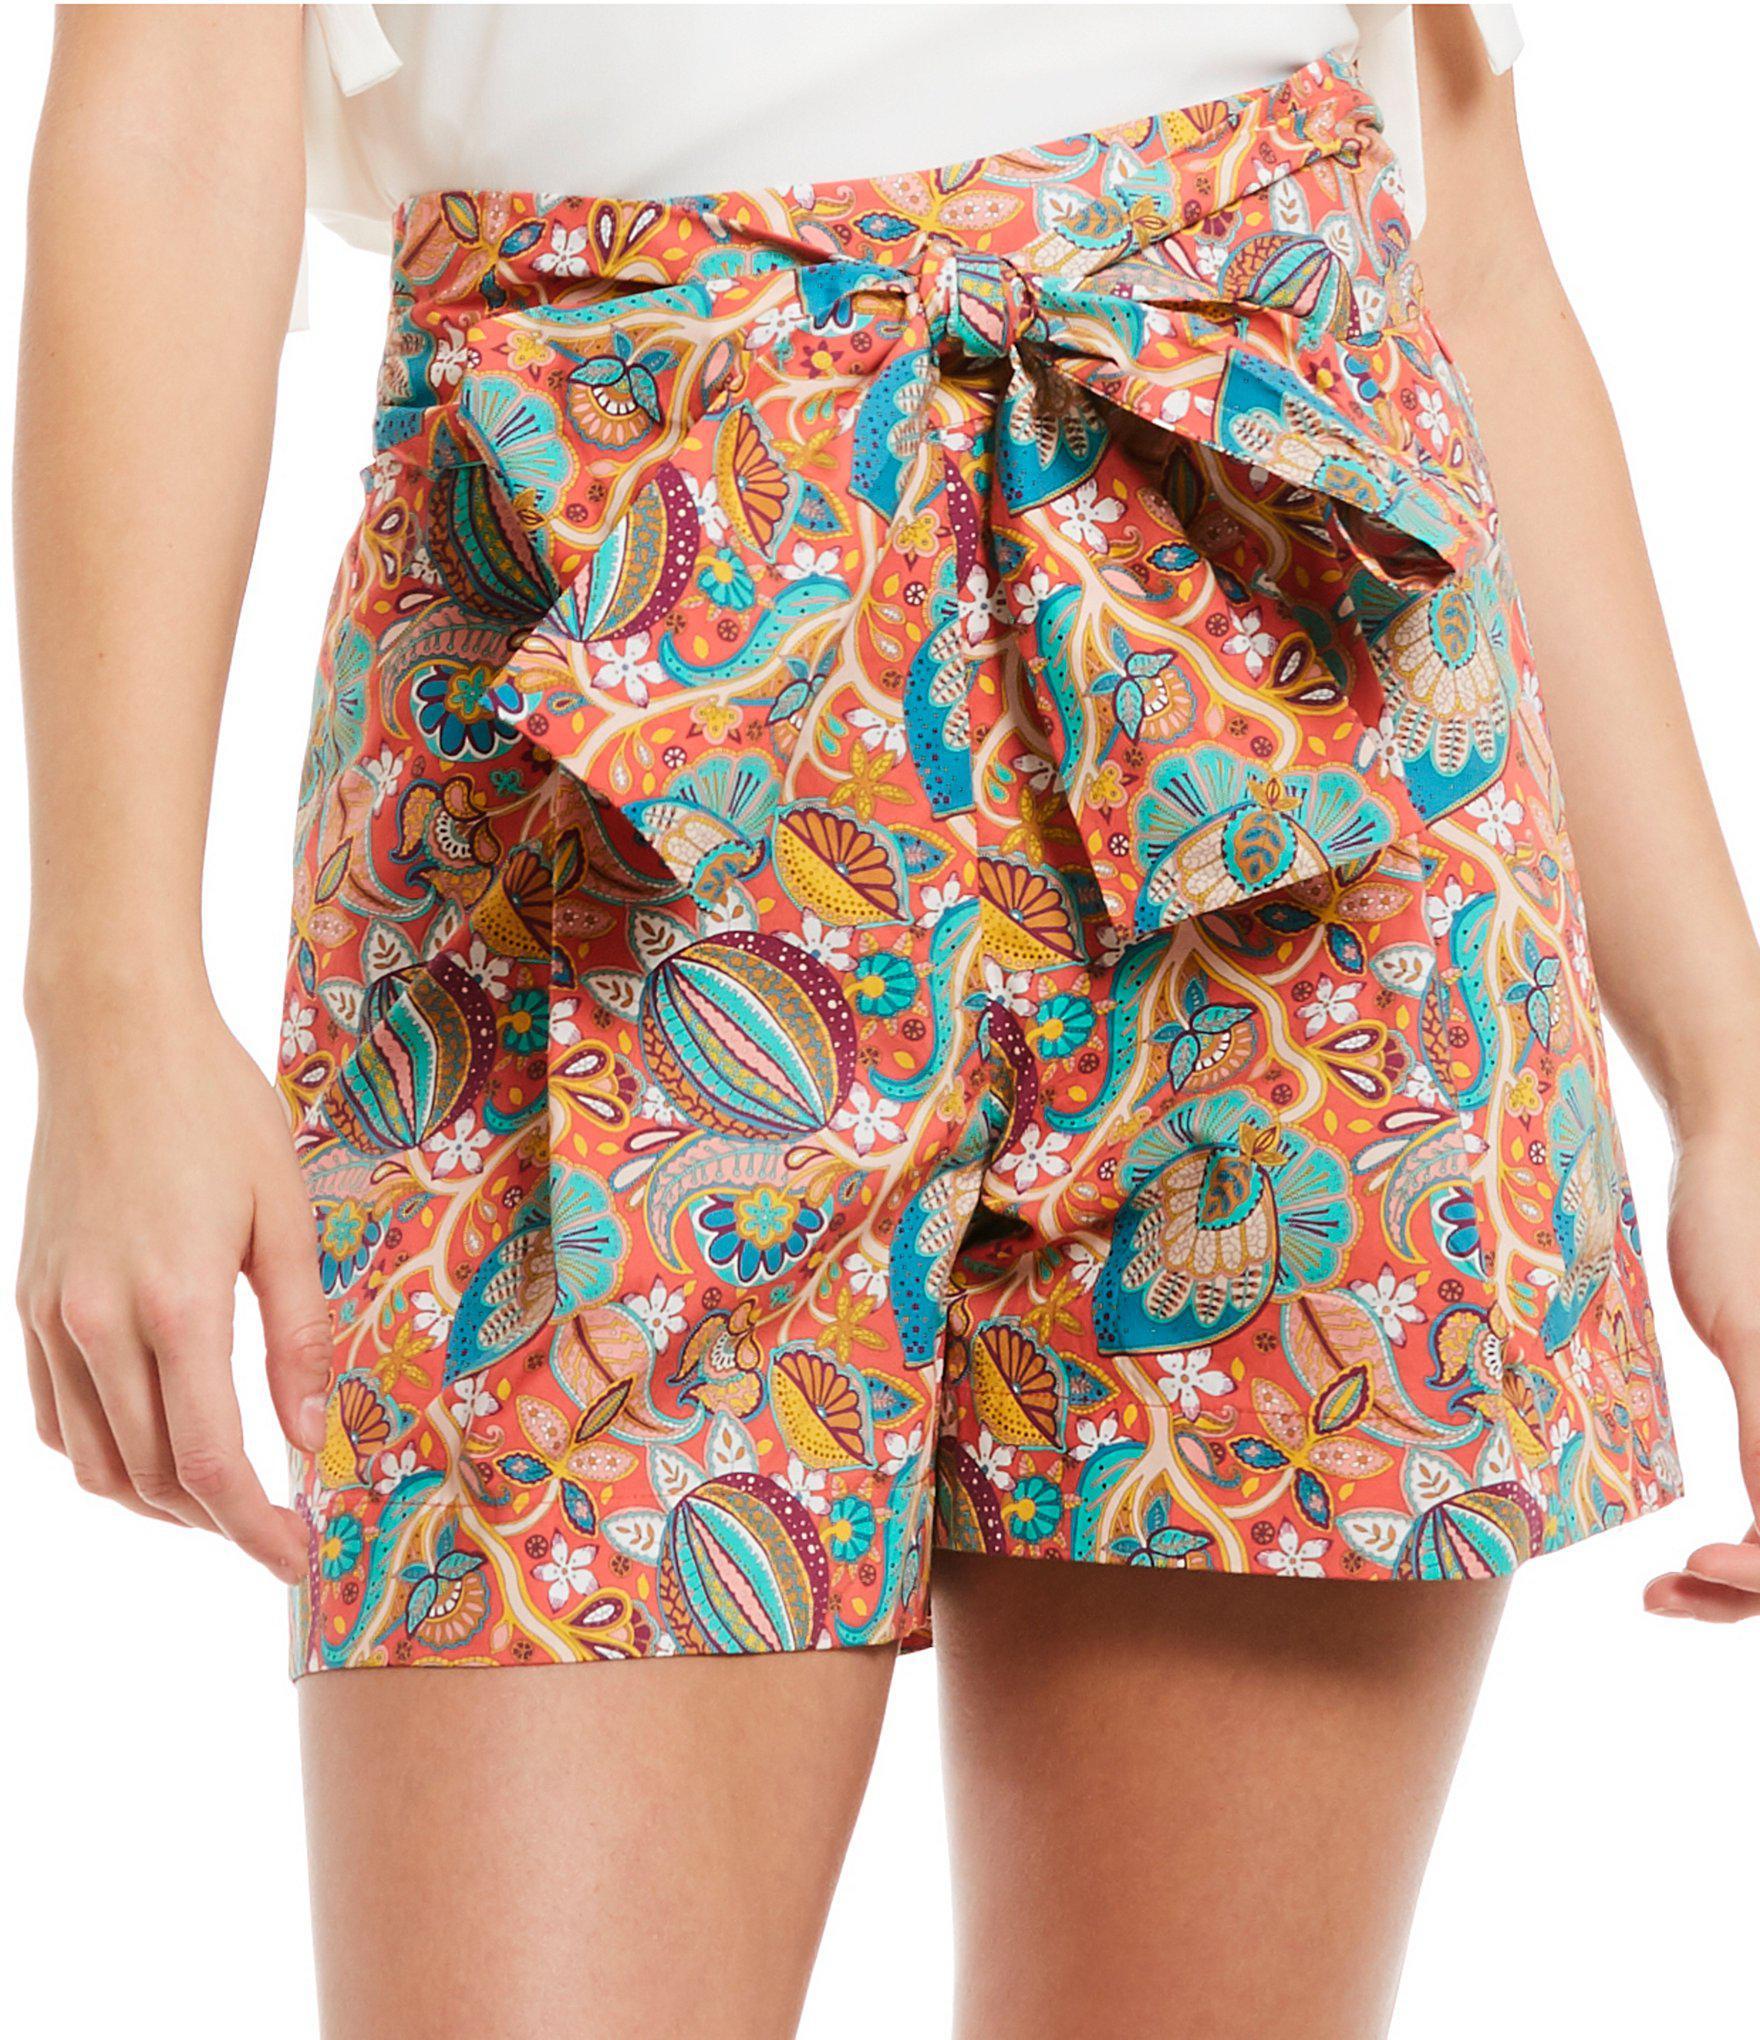 e488973d503 Antonio Melani Made With Liberty Fabrics Paisley Dawson Short - Lyst